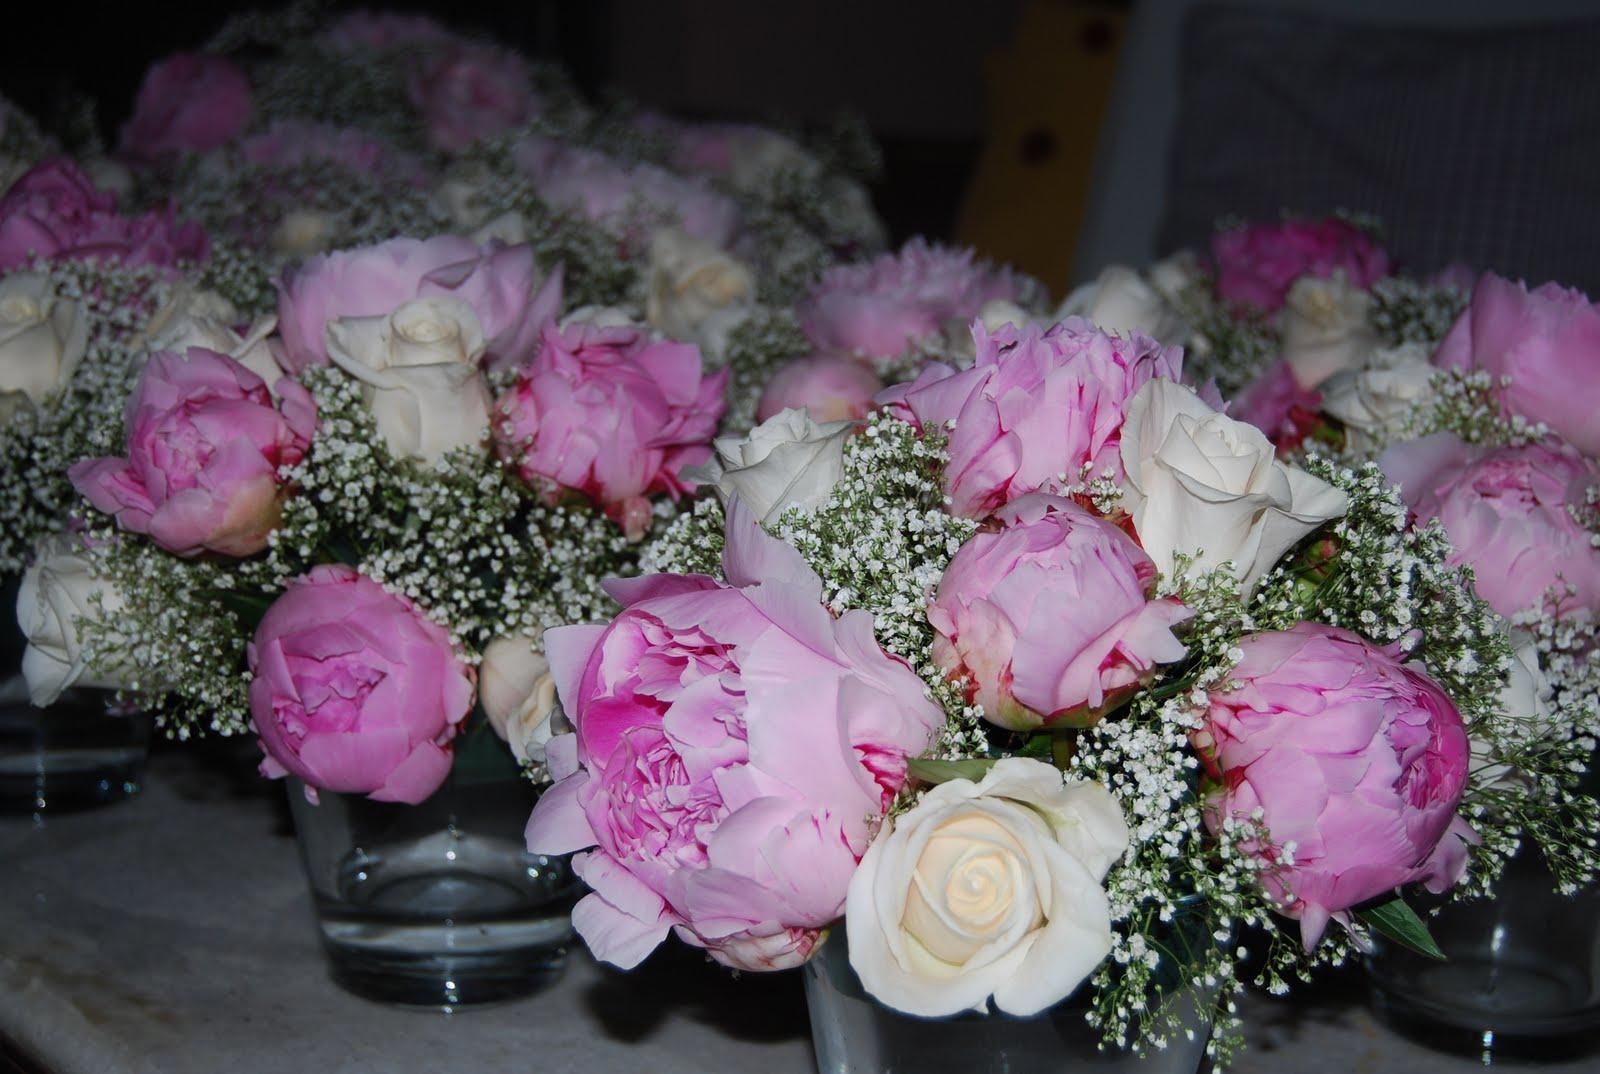 Delipapel: Centros de mesa de flores